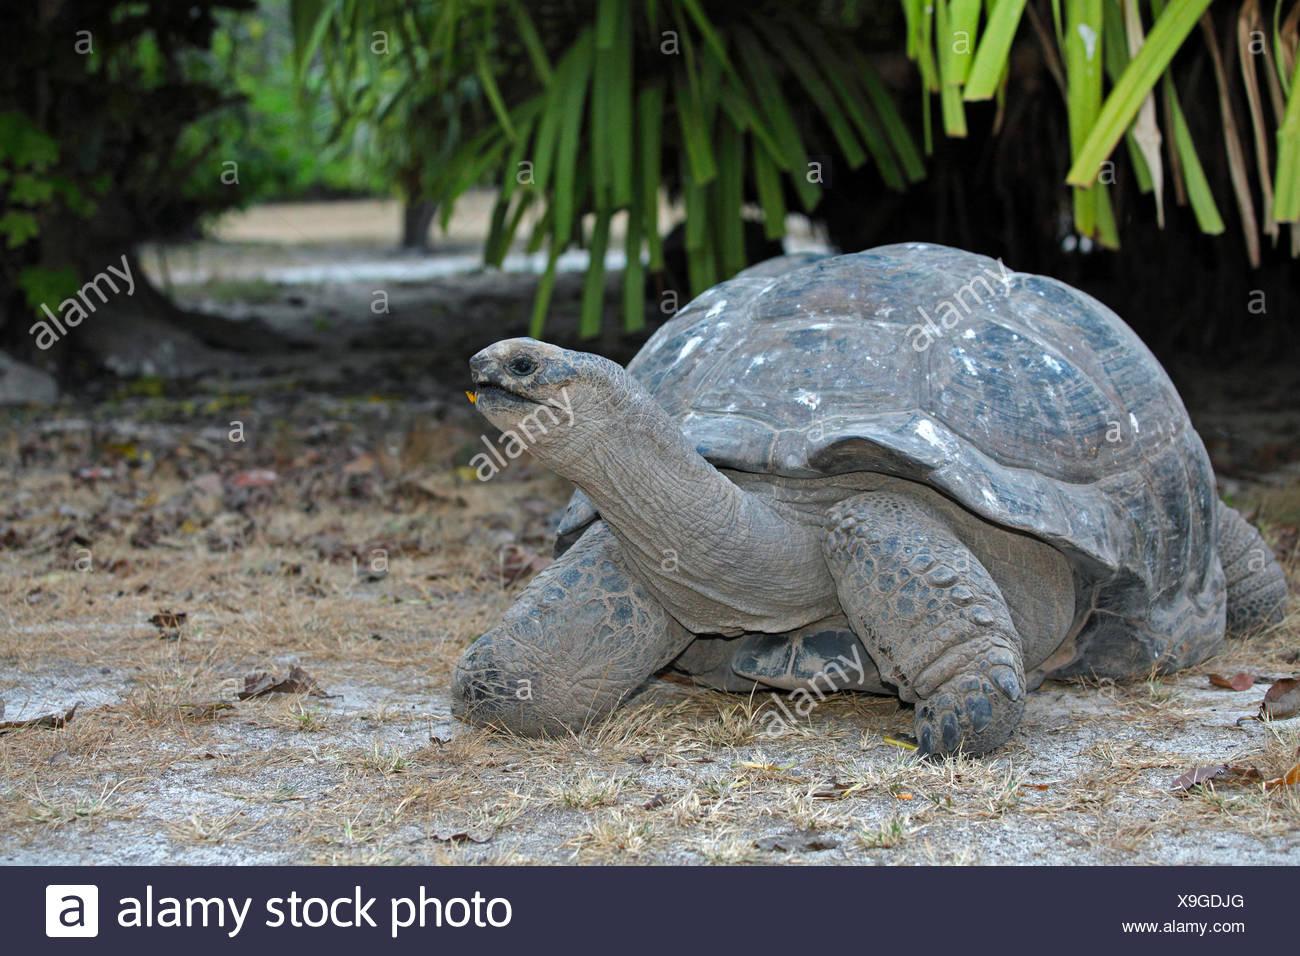 Seychelles giant tortoise, Aldabran giant tortoise, Aldabra giant tortoise (Aldabrachelys gigantea, Testudo gigantea, Geochelone gigantea, Megalochelys gigantea), in habitat, Seychelles, Bird Island - Stock Image